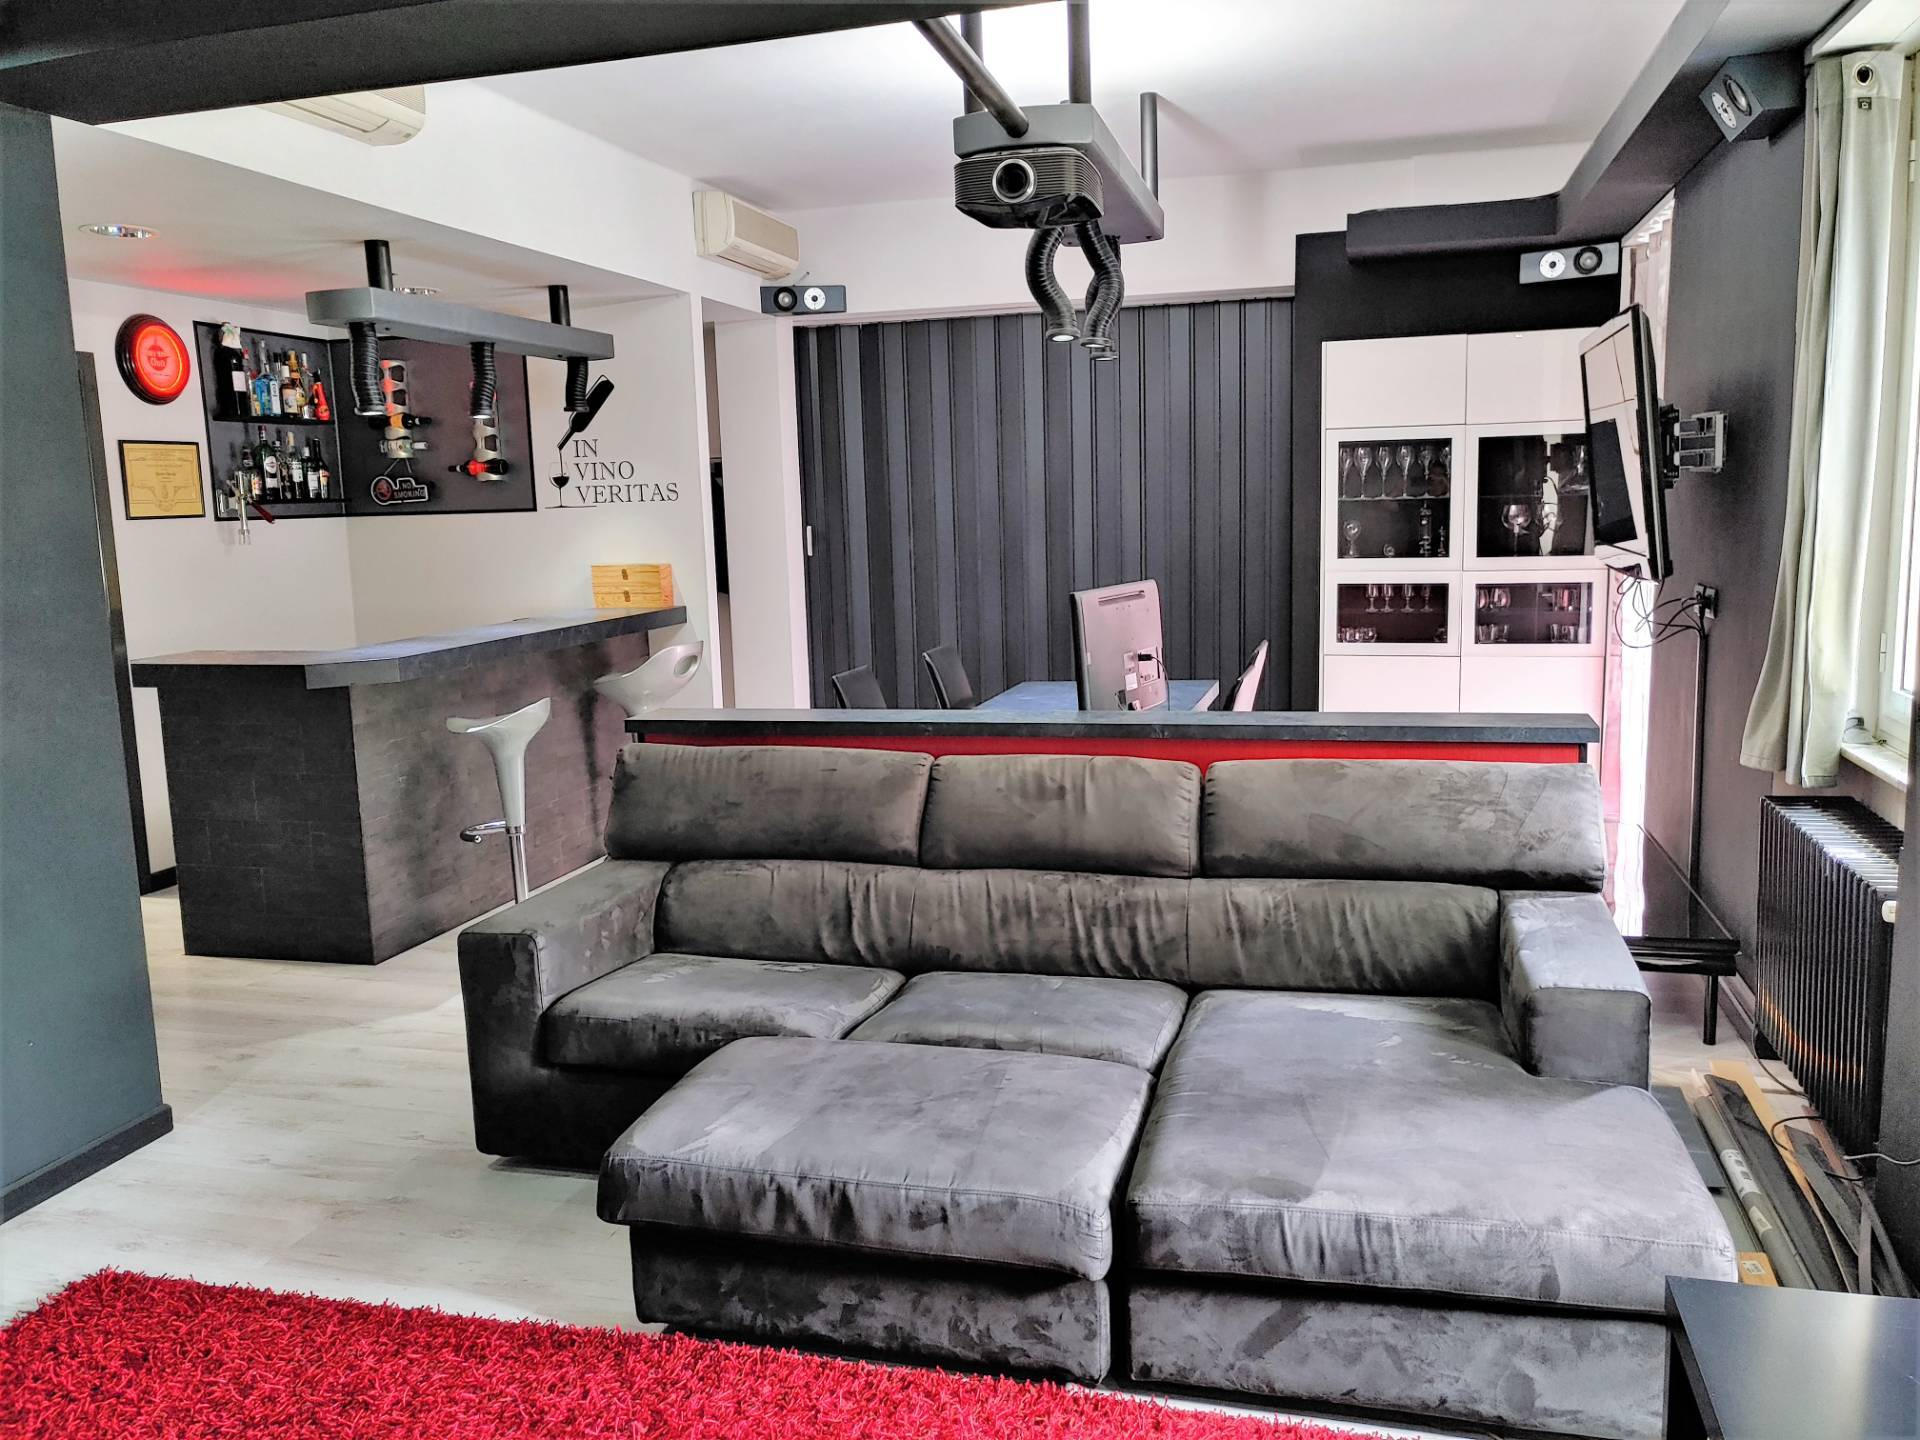 Vendita Quadrilocale Appartamento Alessandria 243149